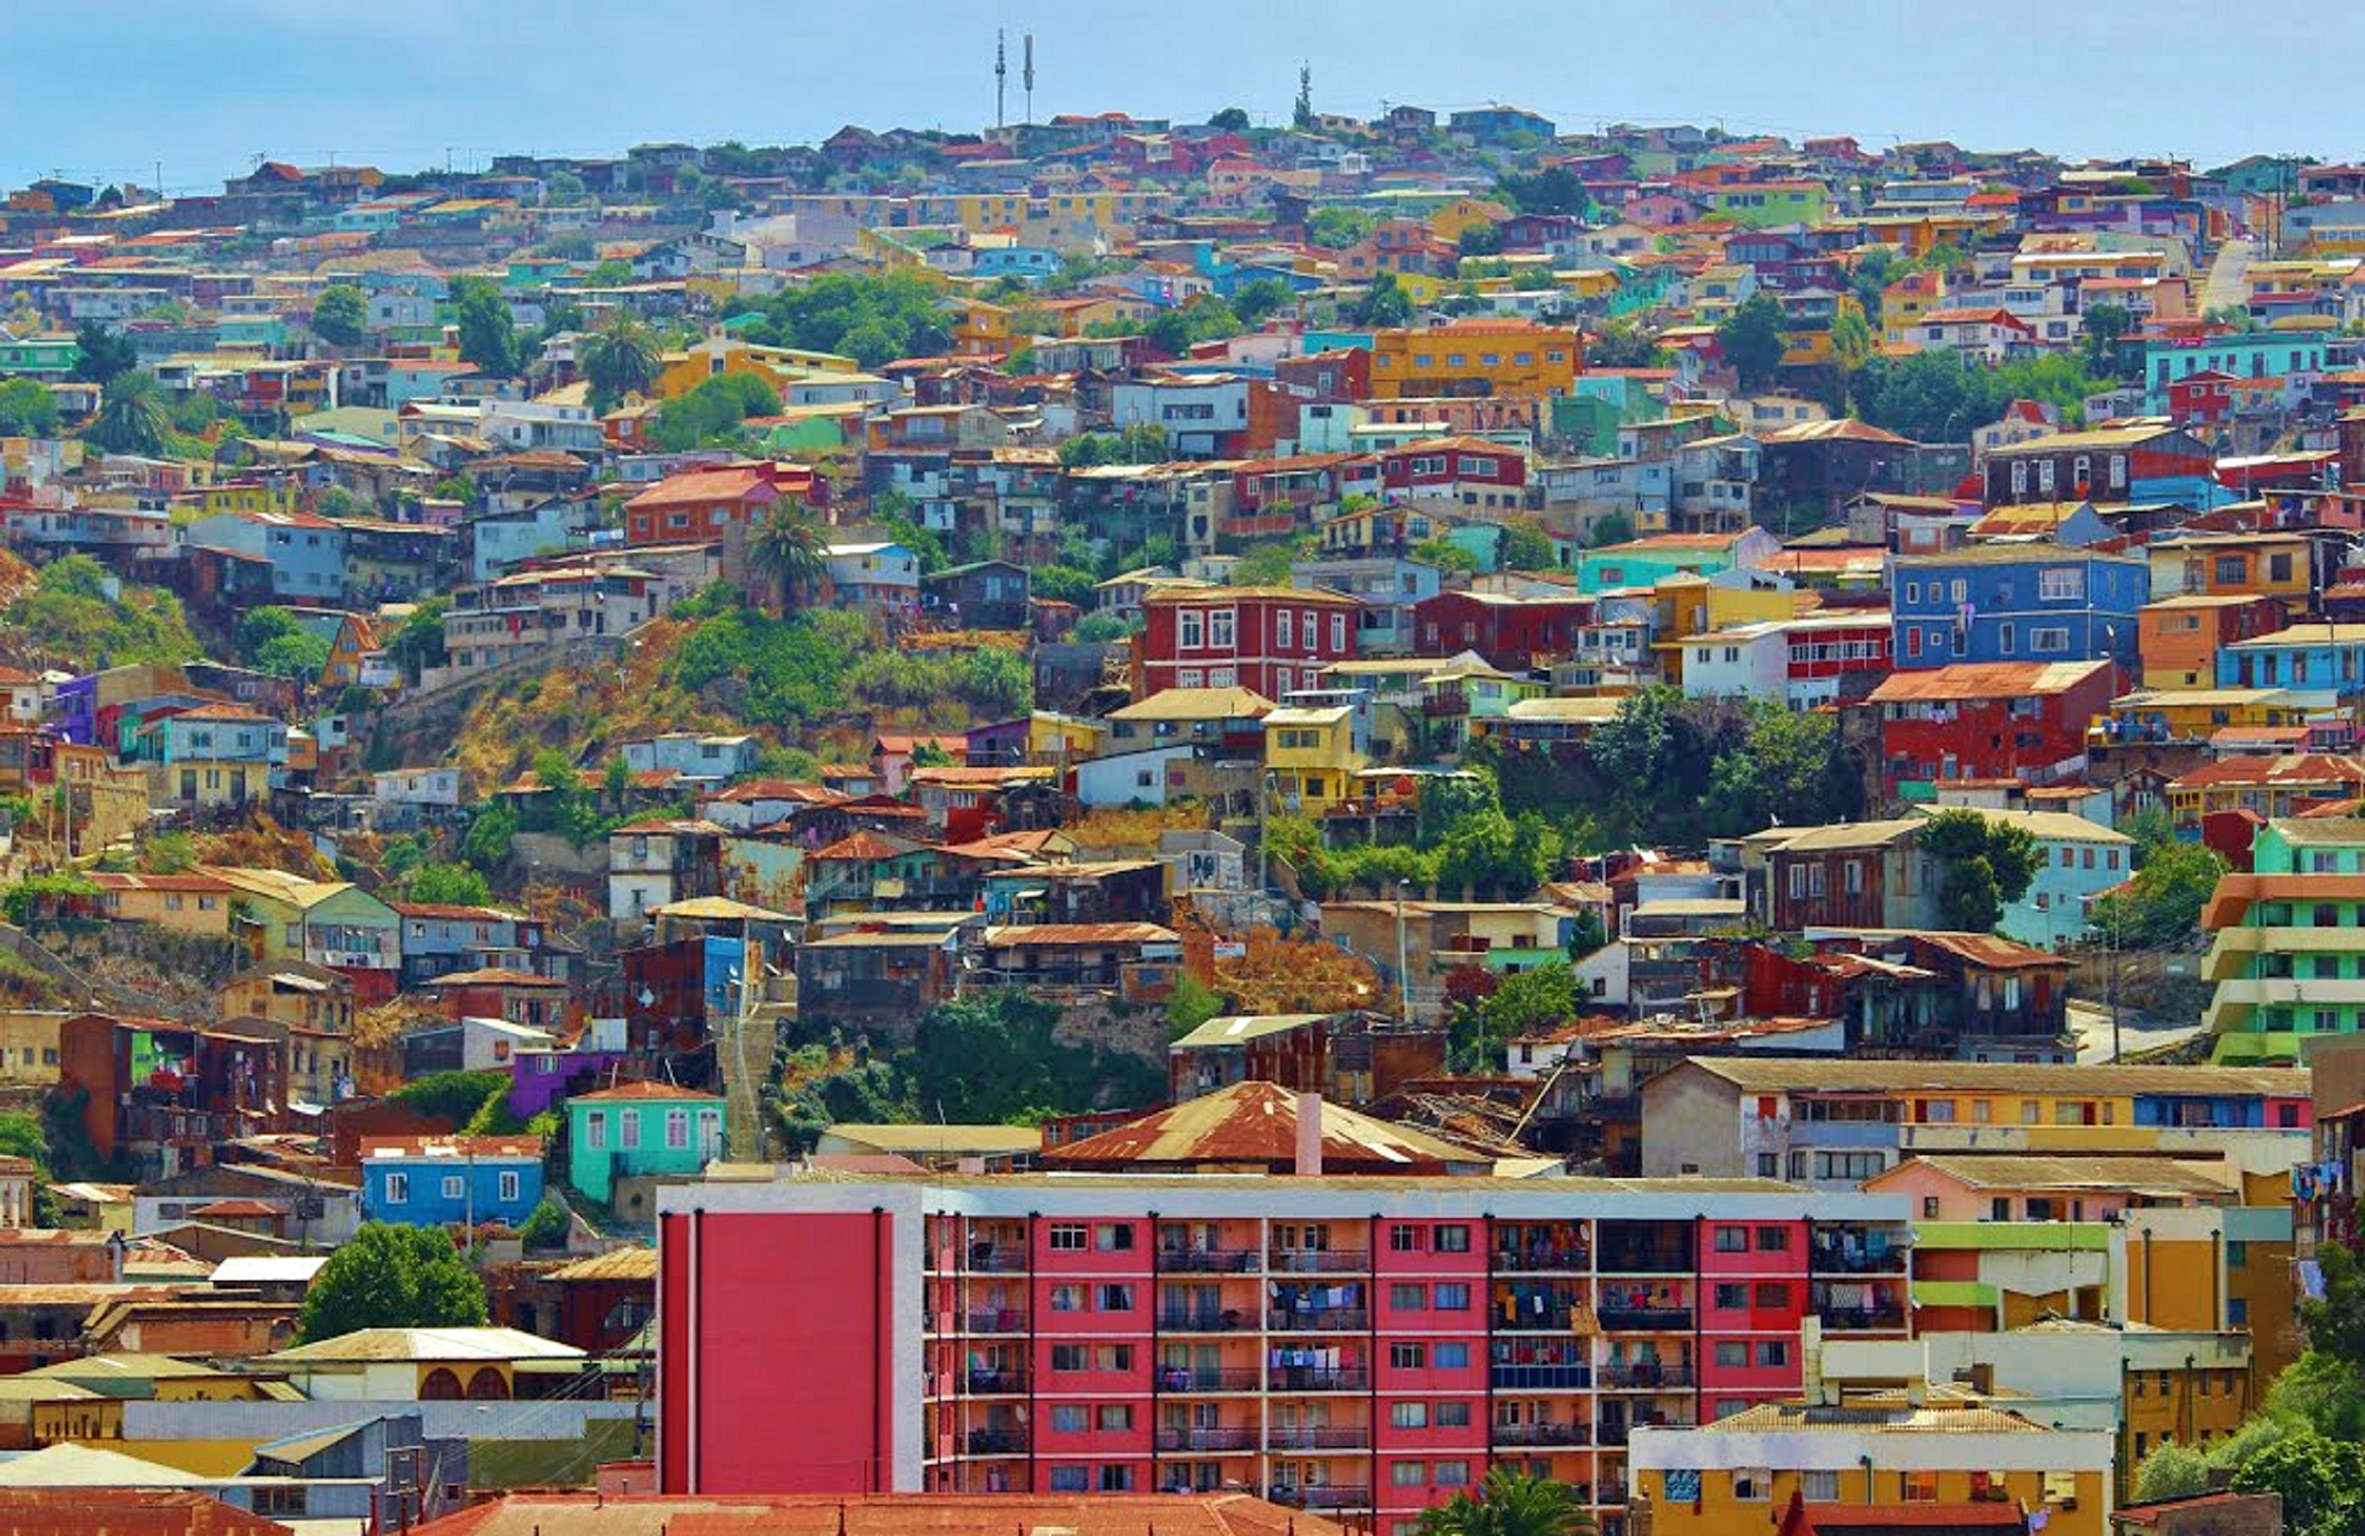 img_Chile_Valparaiso_MMPixabay_0